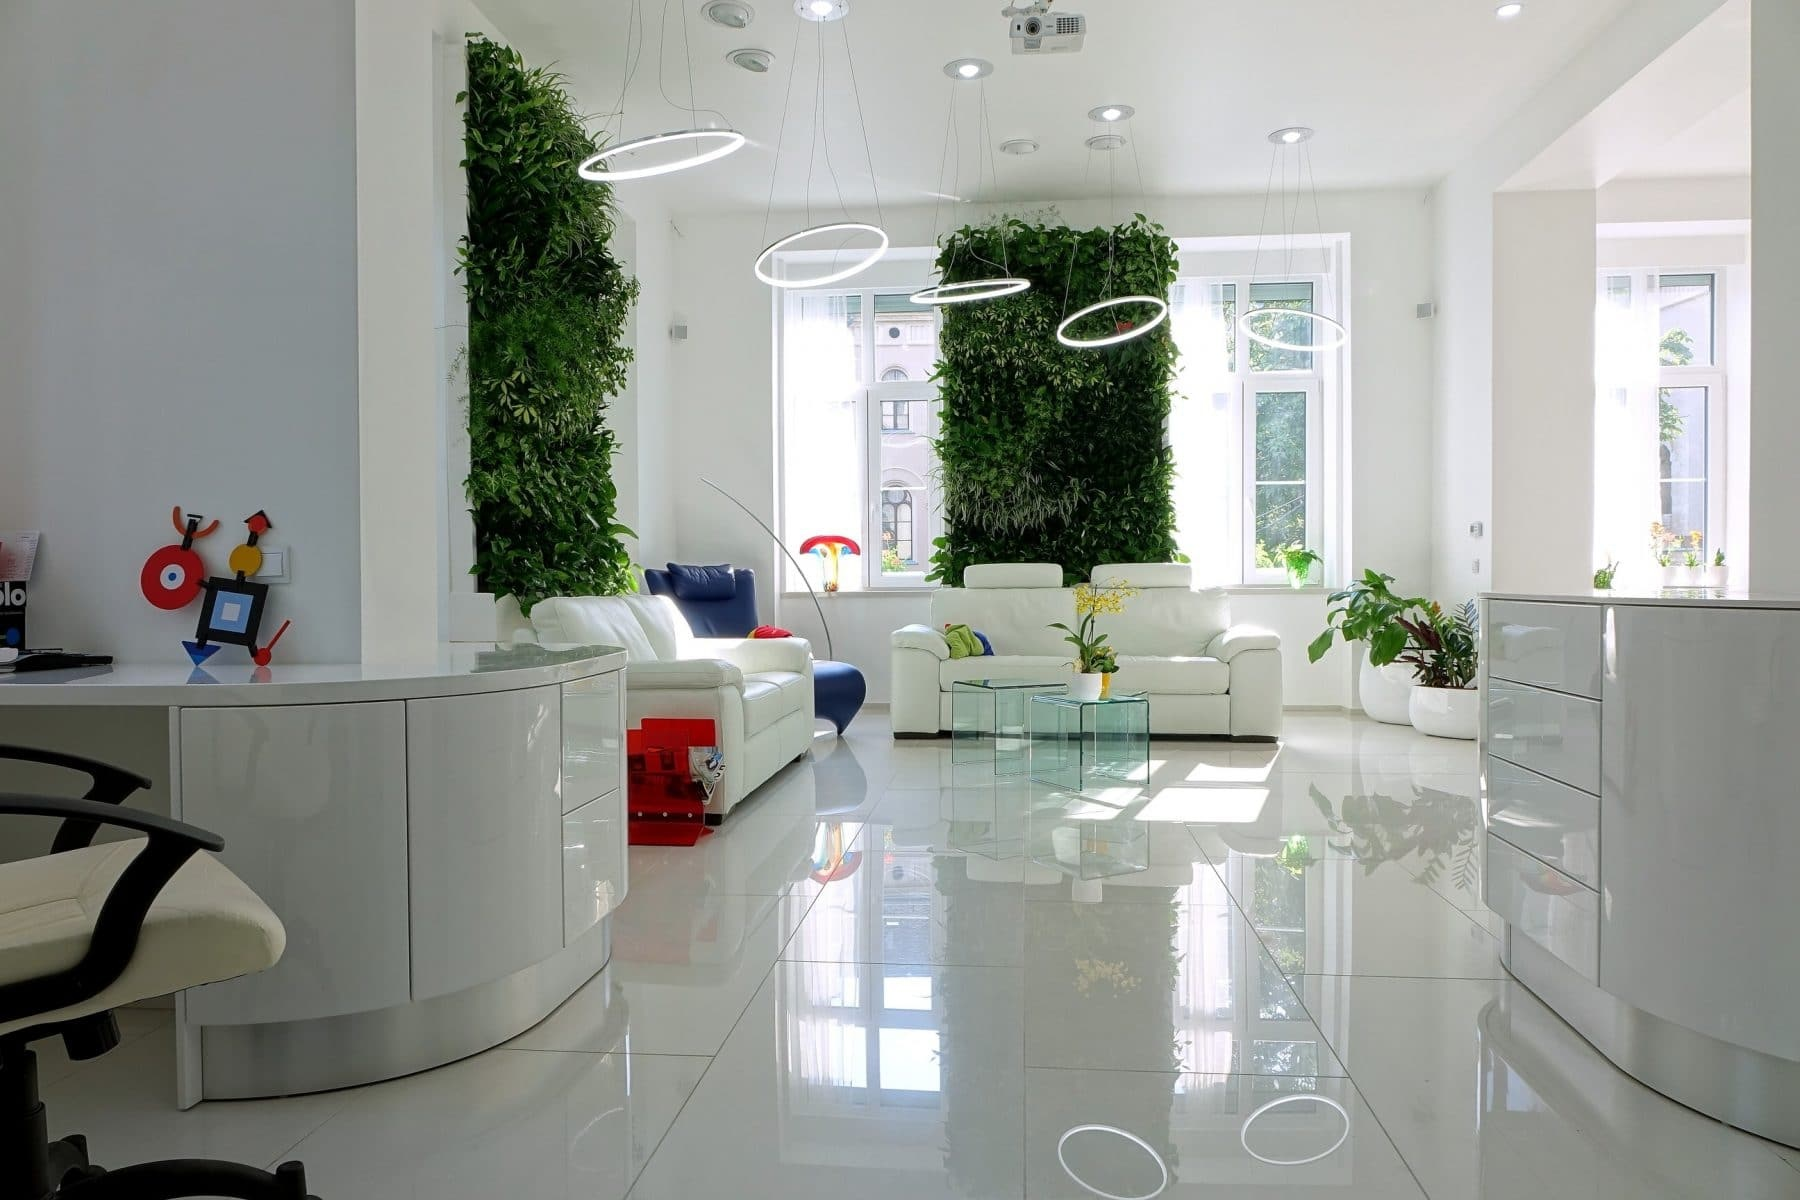 halasz-utca-modern-design-apartment-budapest-dsc00185_filtered